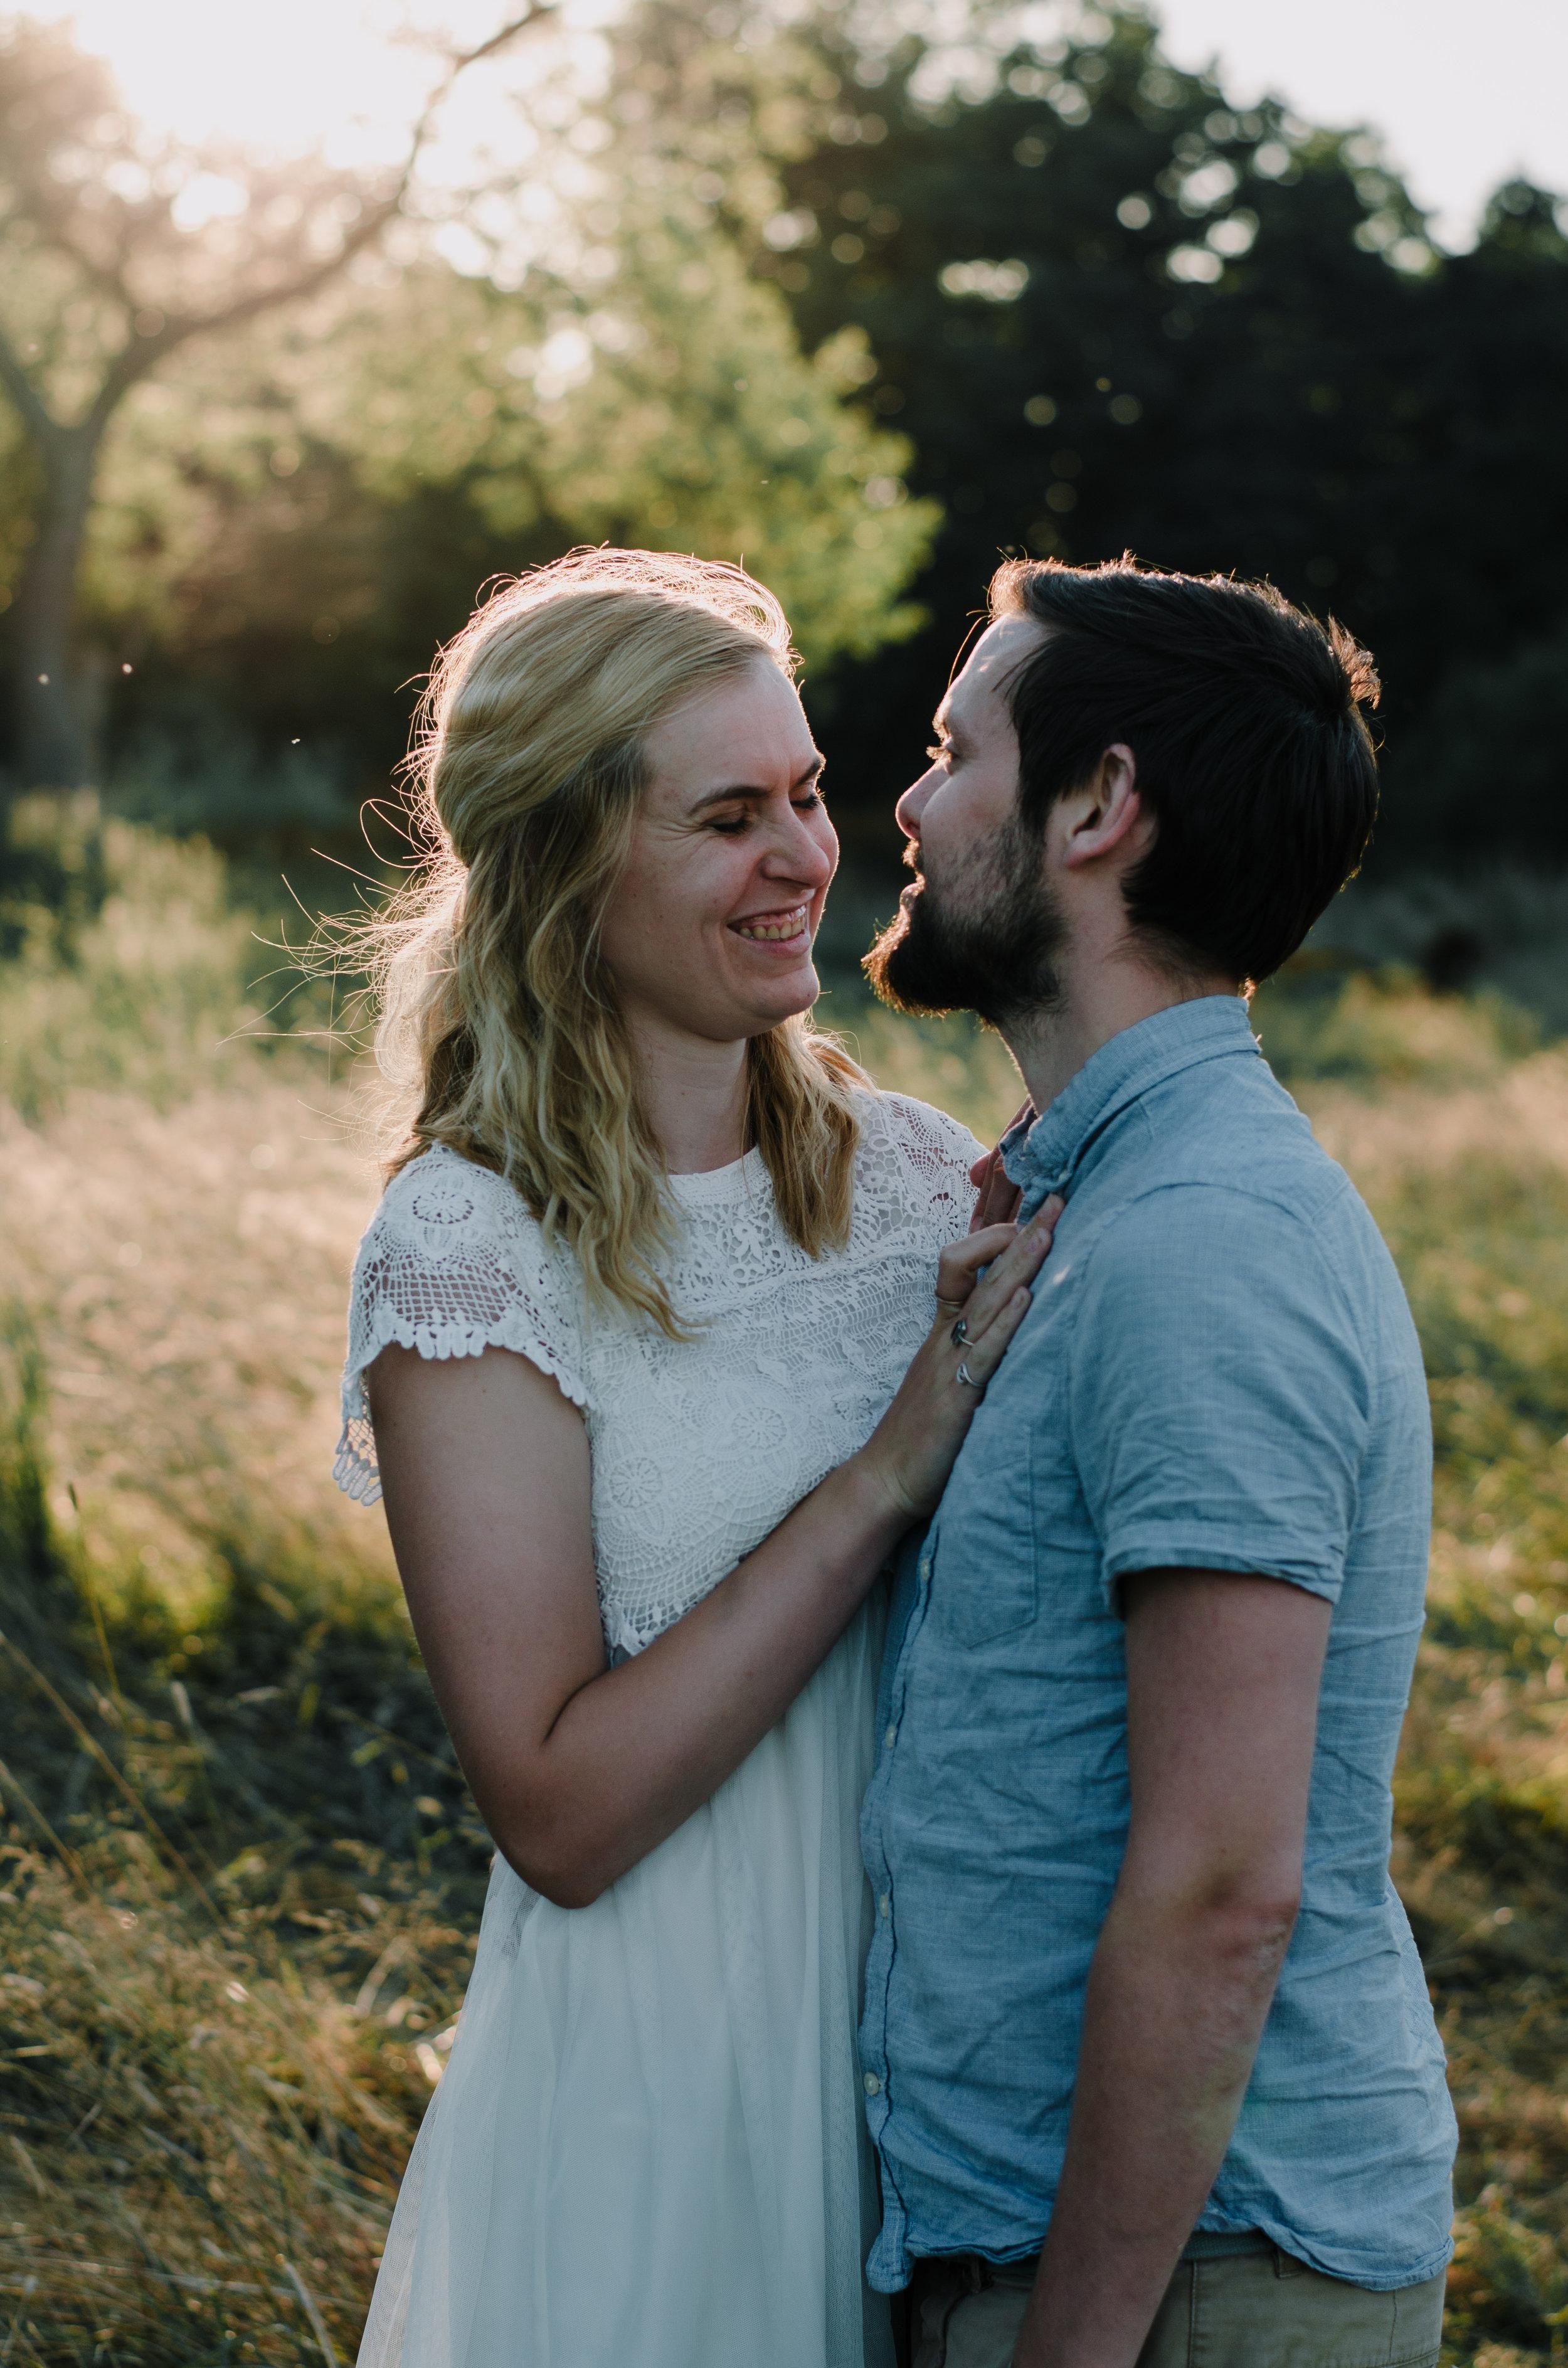 Gina & Chris - Barcombe Mills - Couple Session - Aiste Saulyte Photography-20.jpg